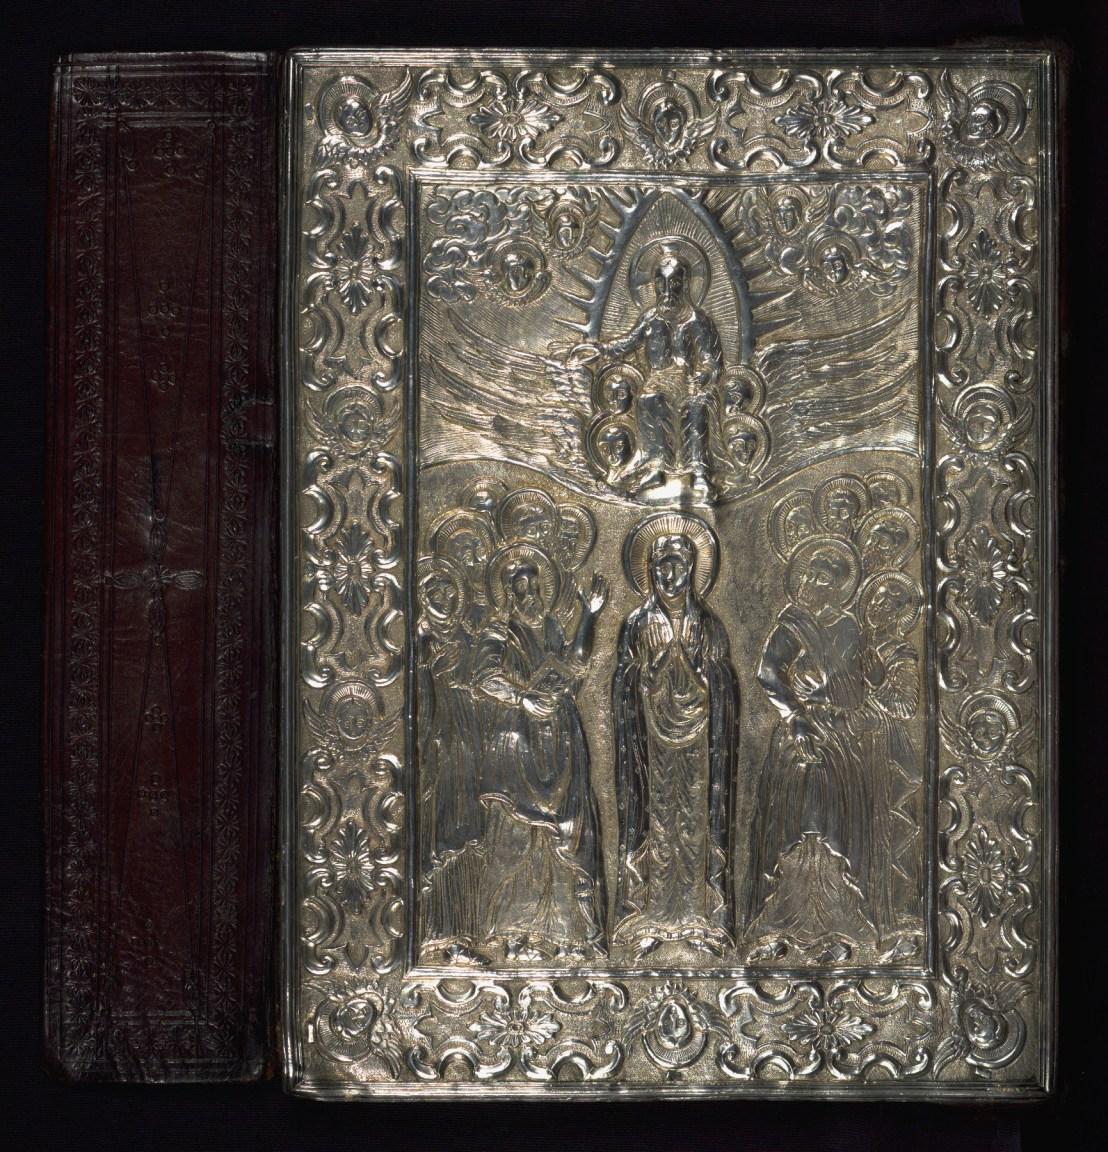 This Gospels manuscript was written in 937 of the Armenian era (1488 CE)